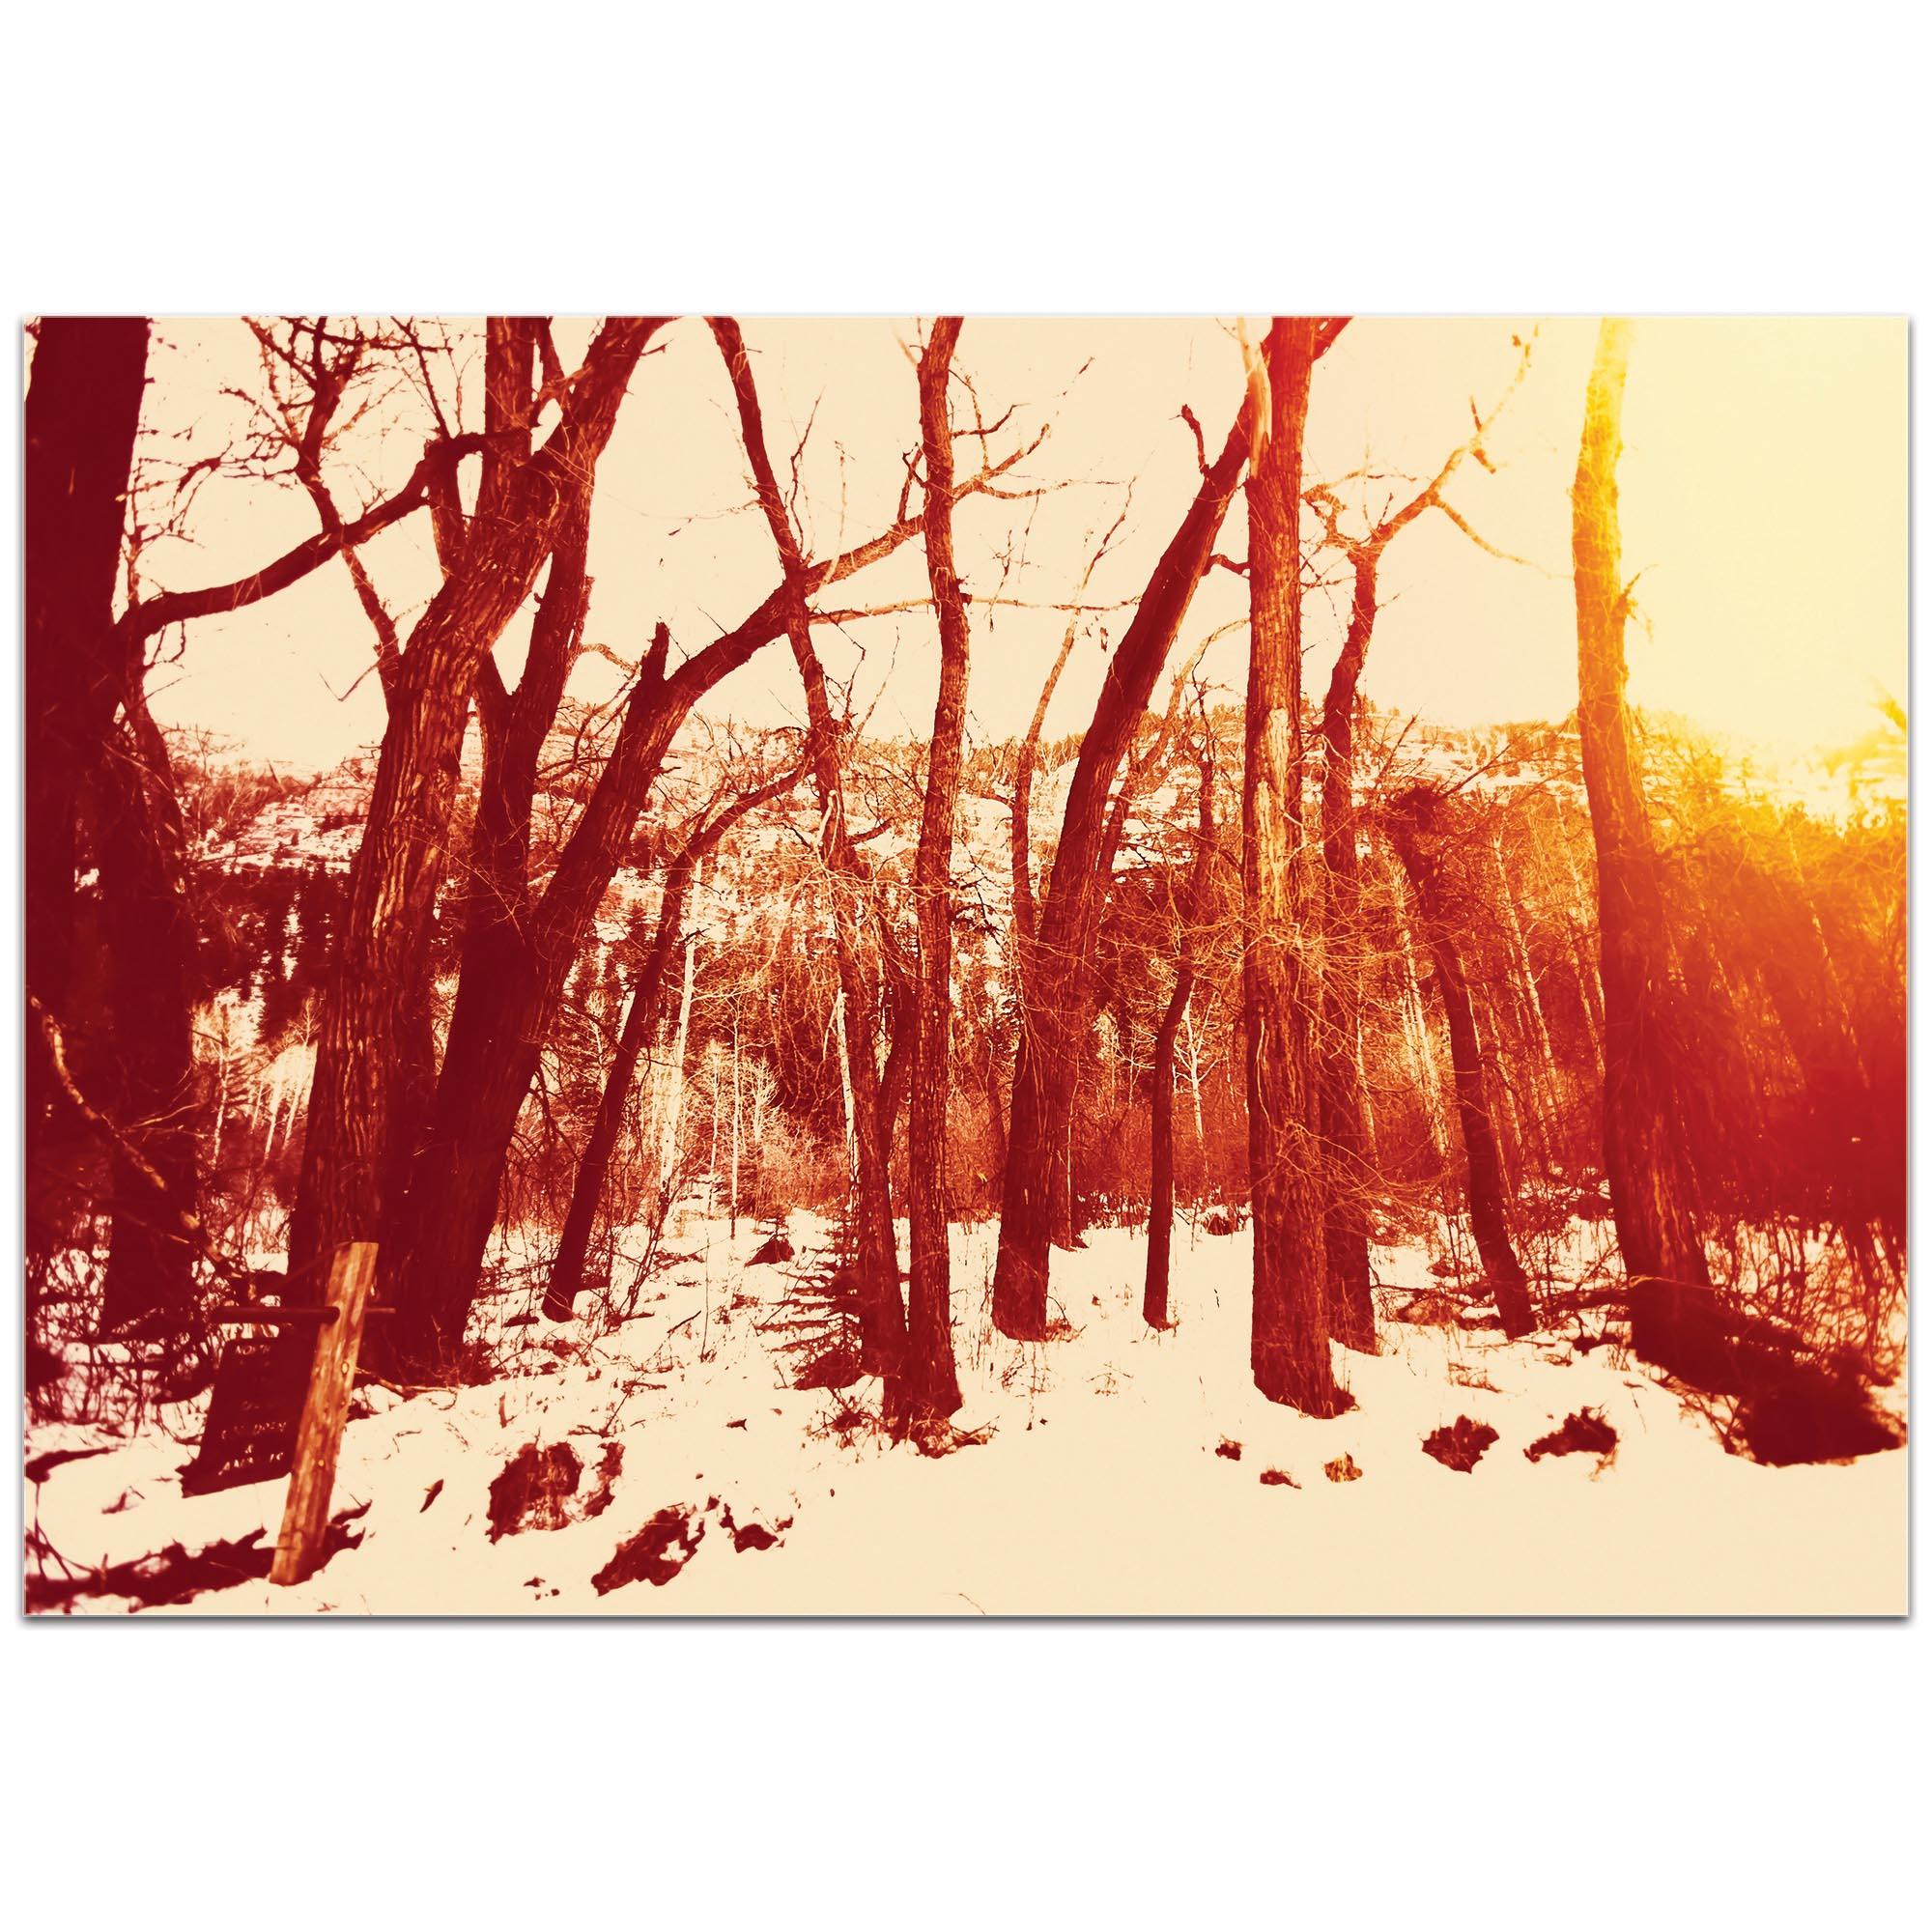 Landscape Photography 'Sepia Snowfall' - Winter Trees Art on Metal or Plexiglass - Image 2